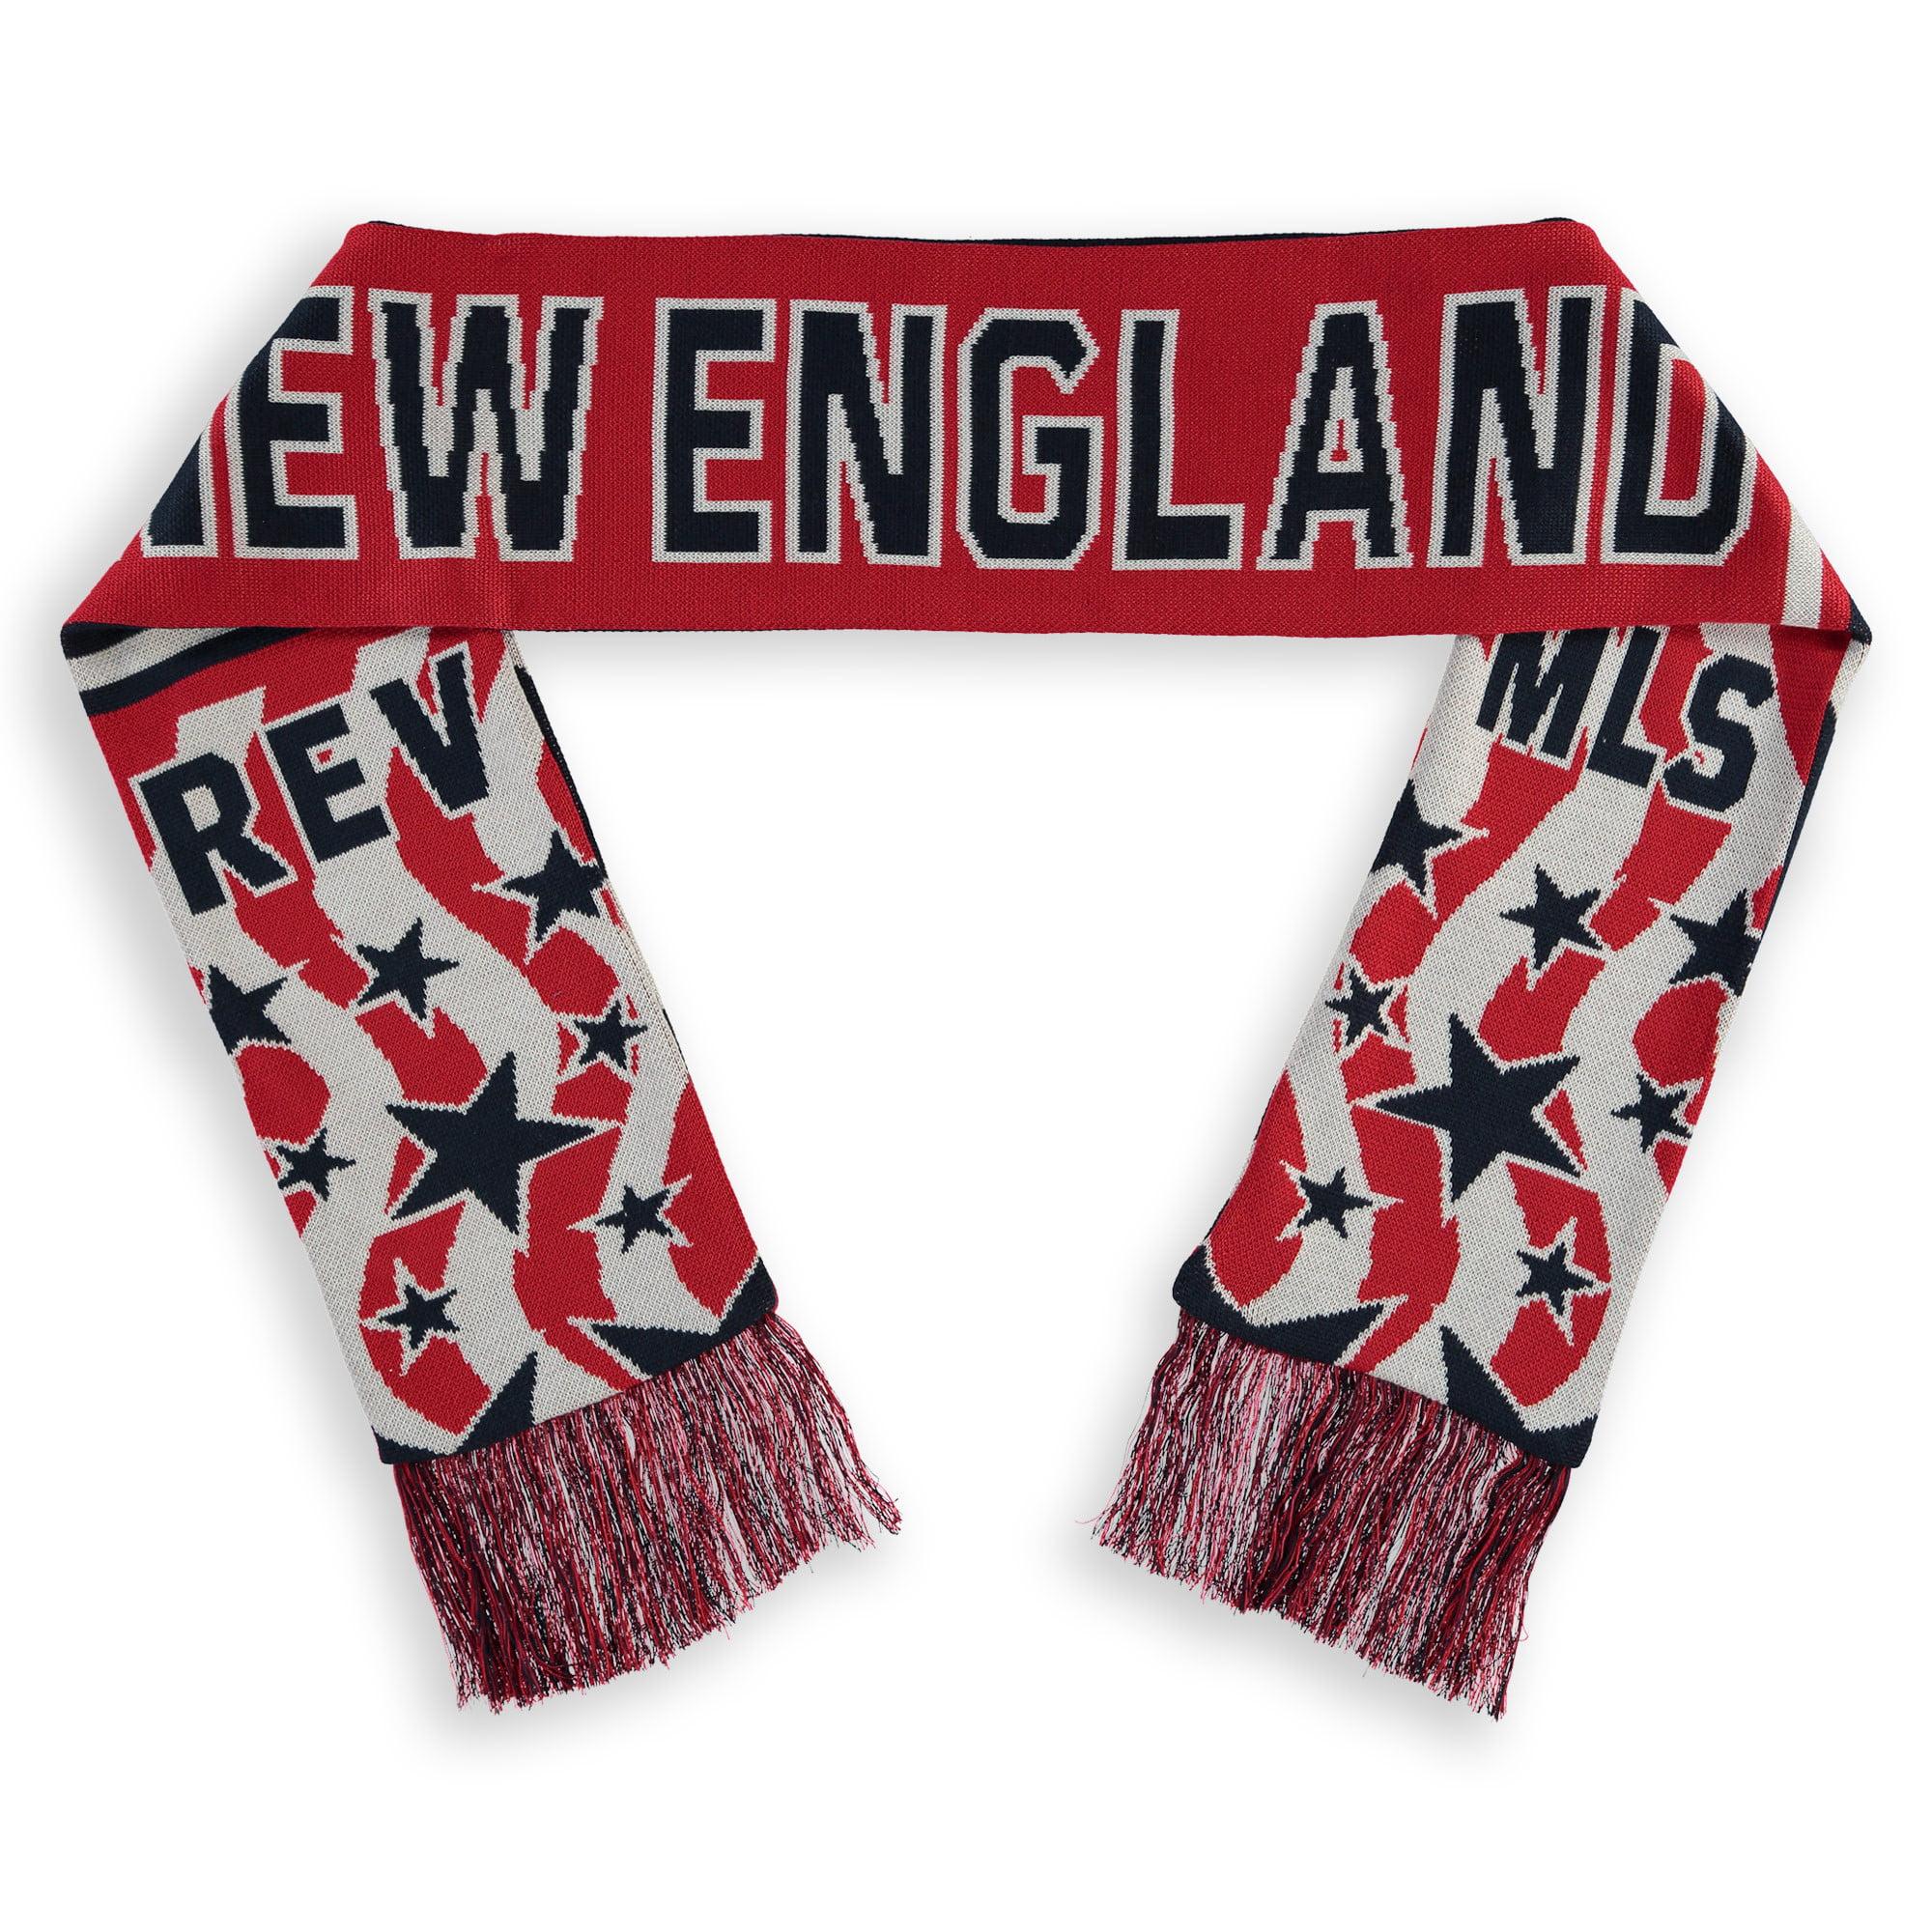 New England Revolution Fanatics Branded Jacquarded Americana Scarf - Navy/White - OSFA